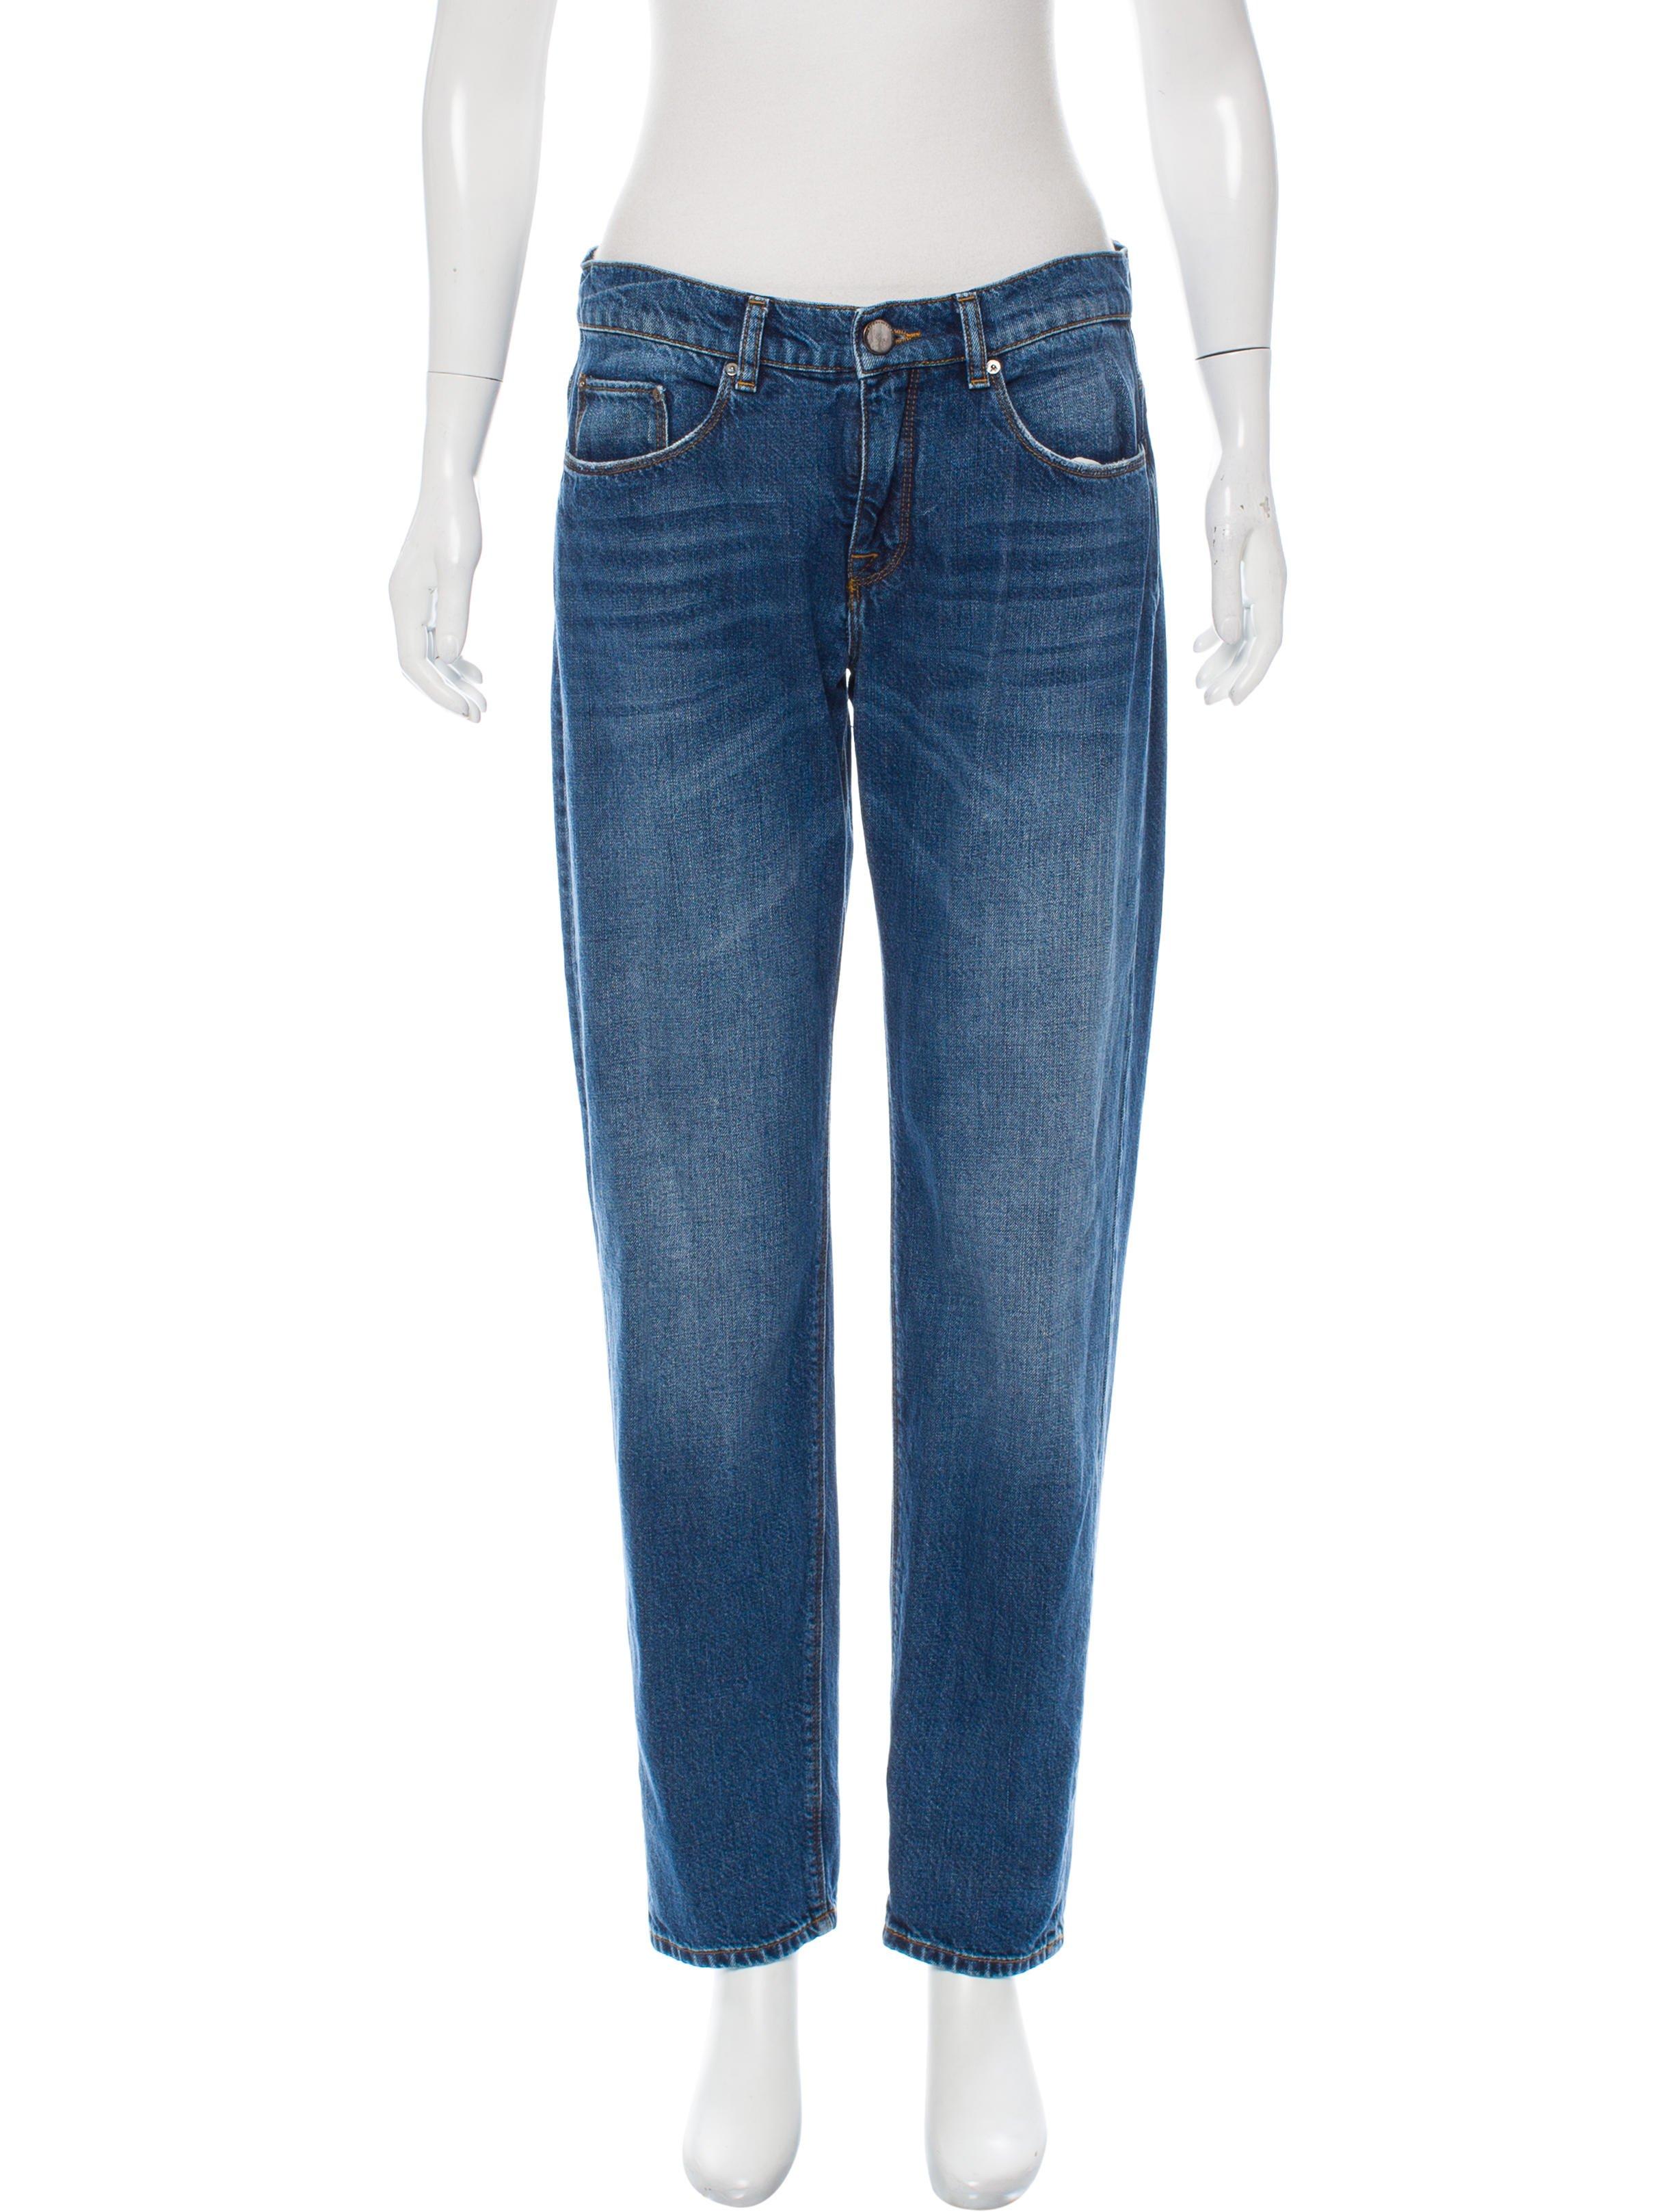 VICTORIA BECKHAM Mid-Rise Straight-Leg Jean; Size:US 27; $85.00